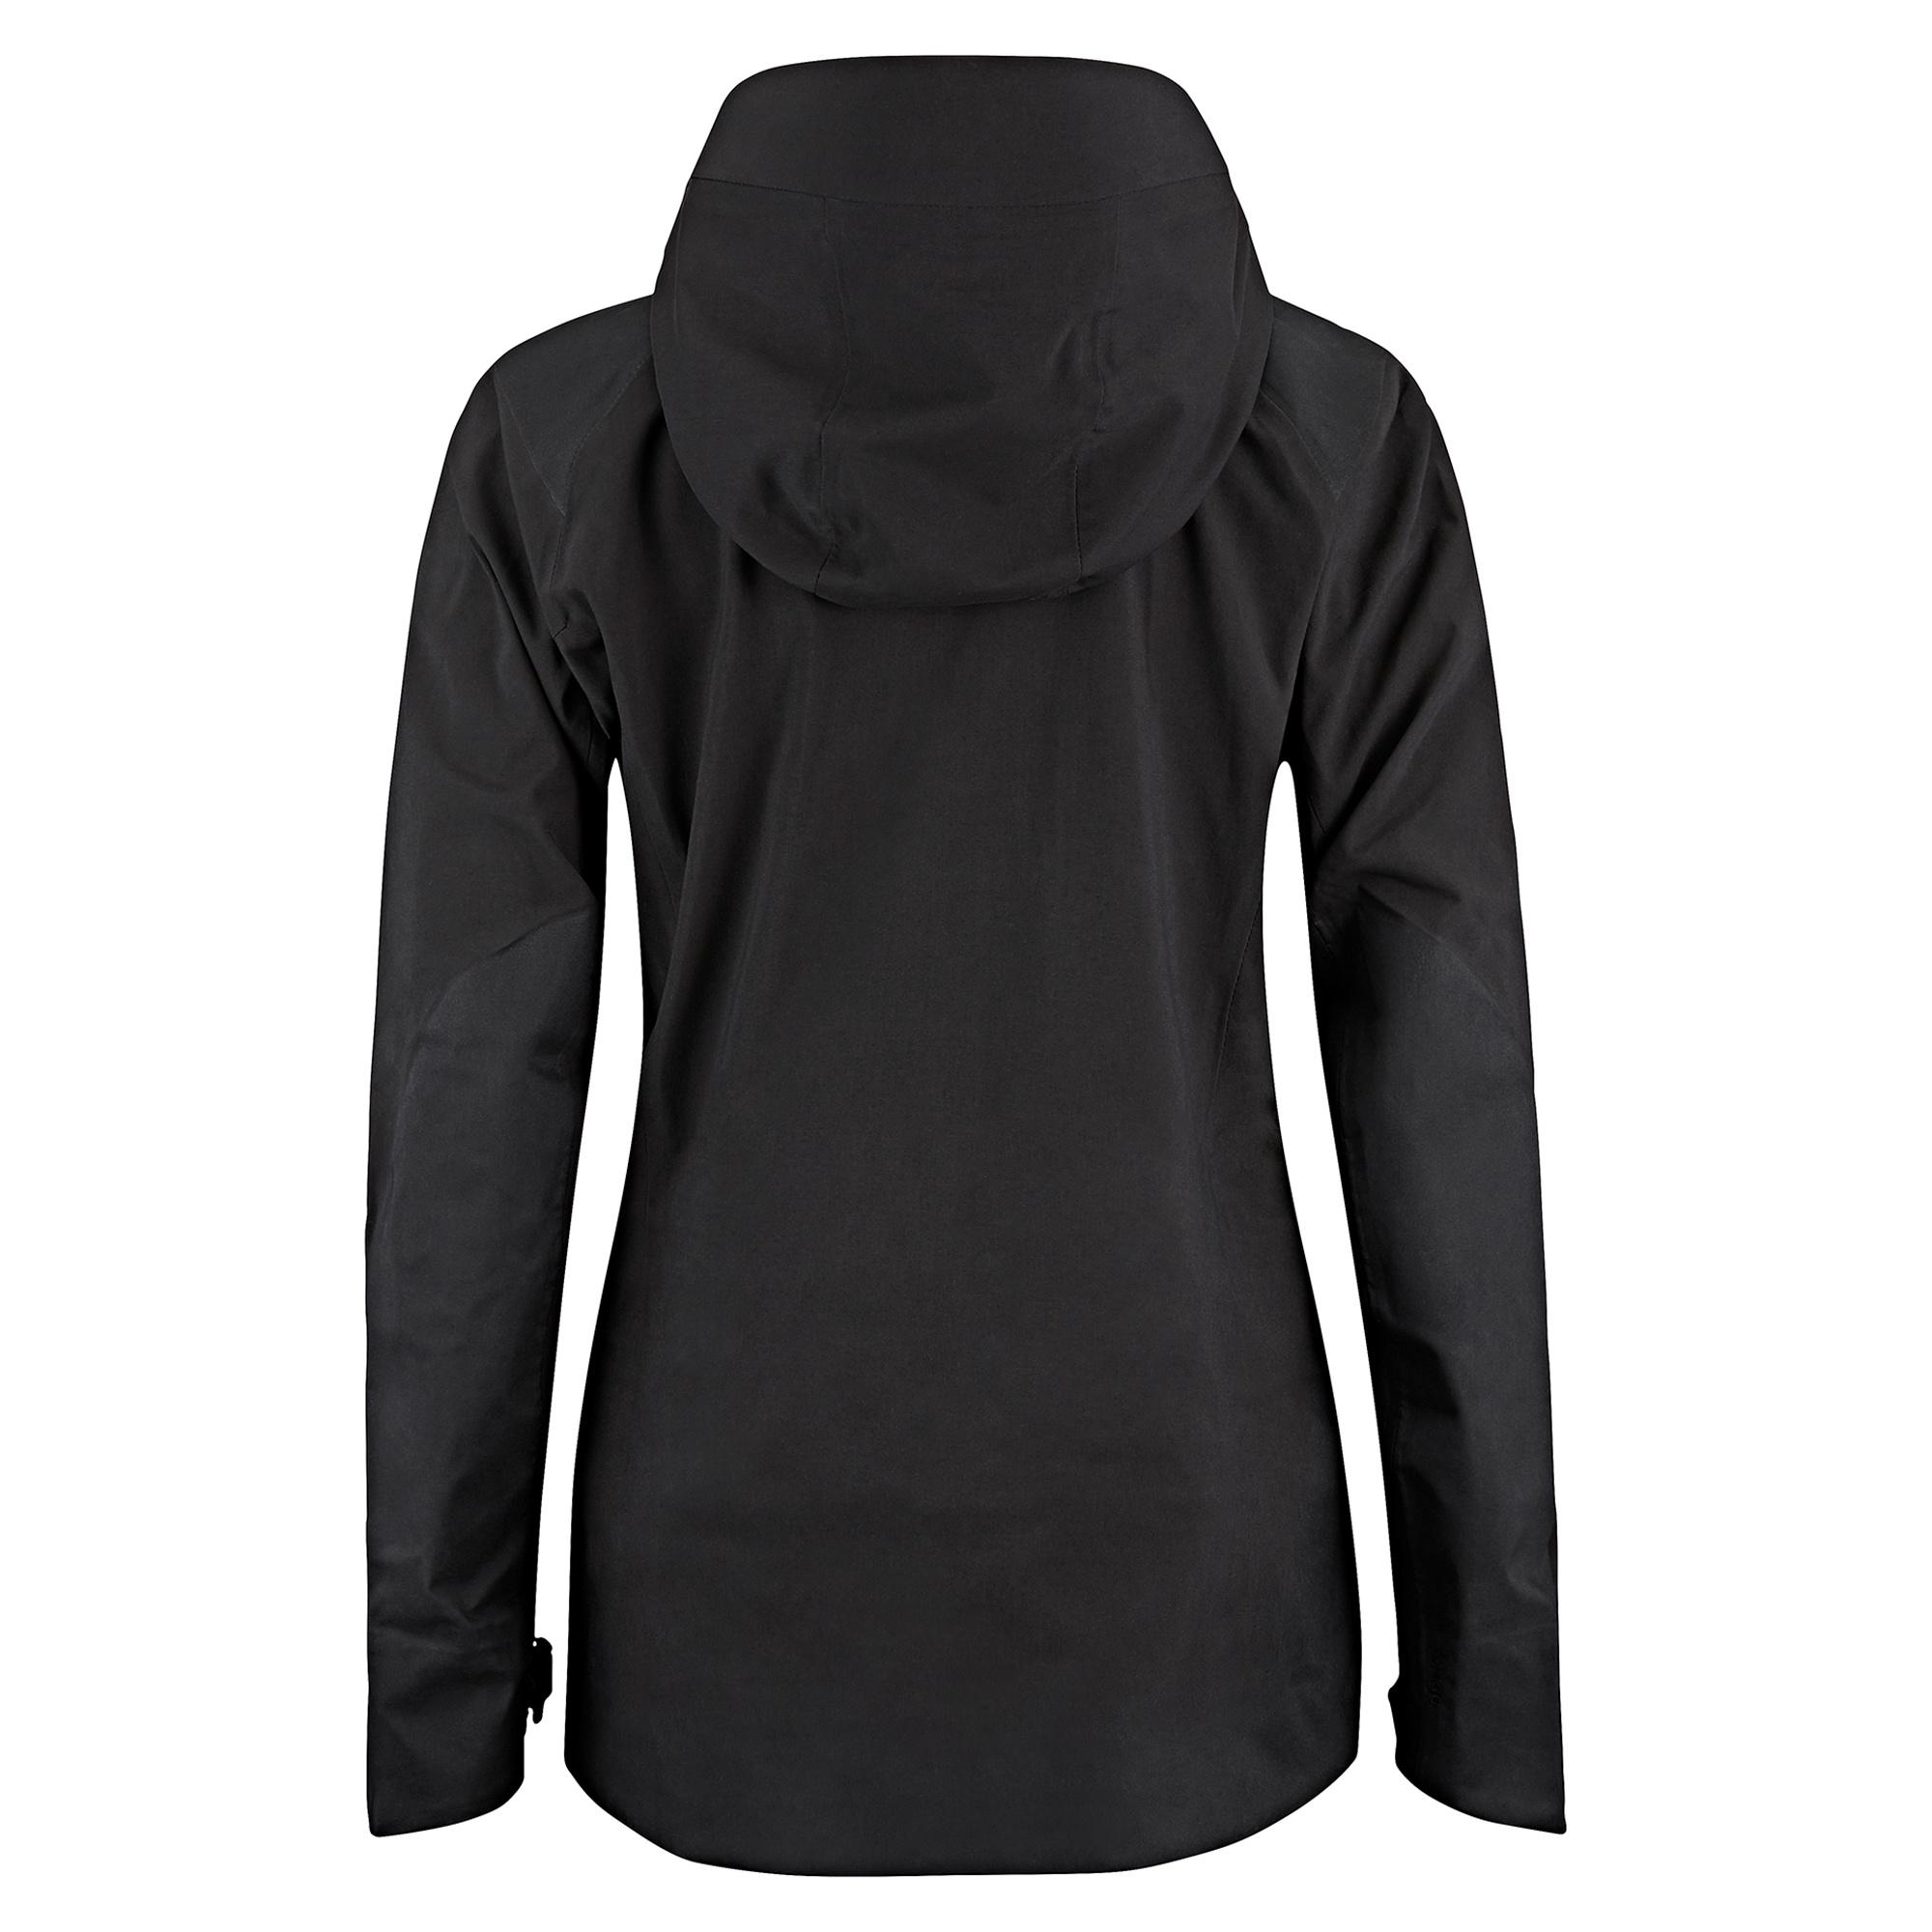 Big product image of Women's Brage Jacket